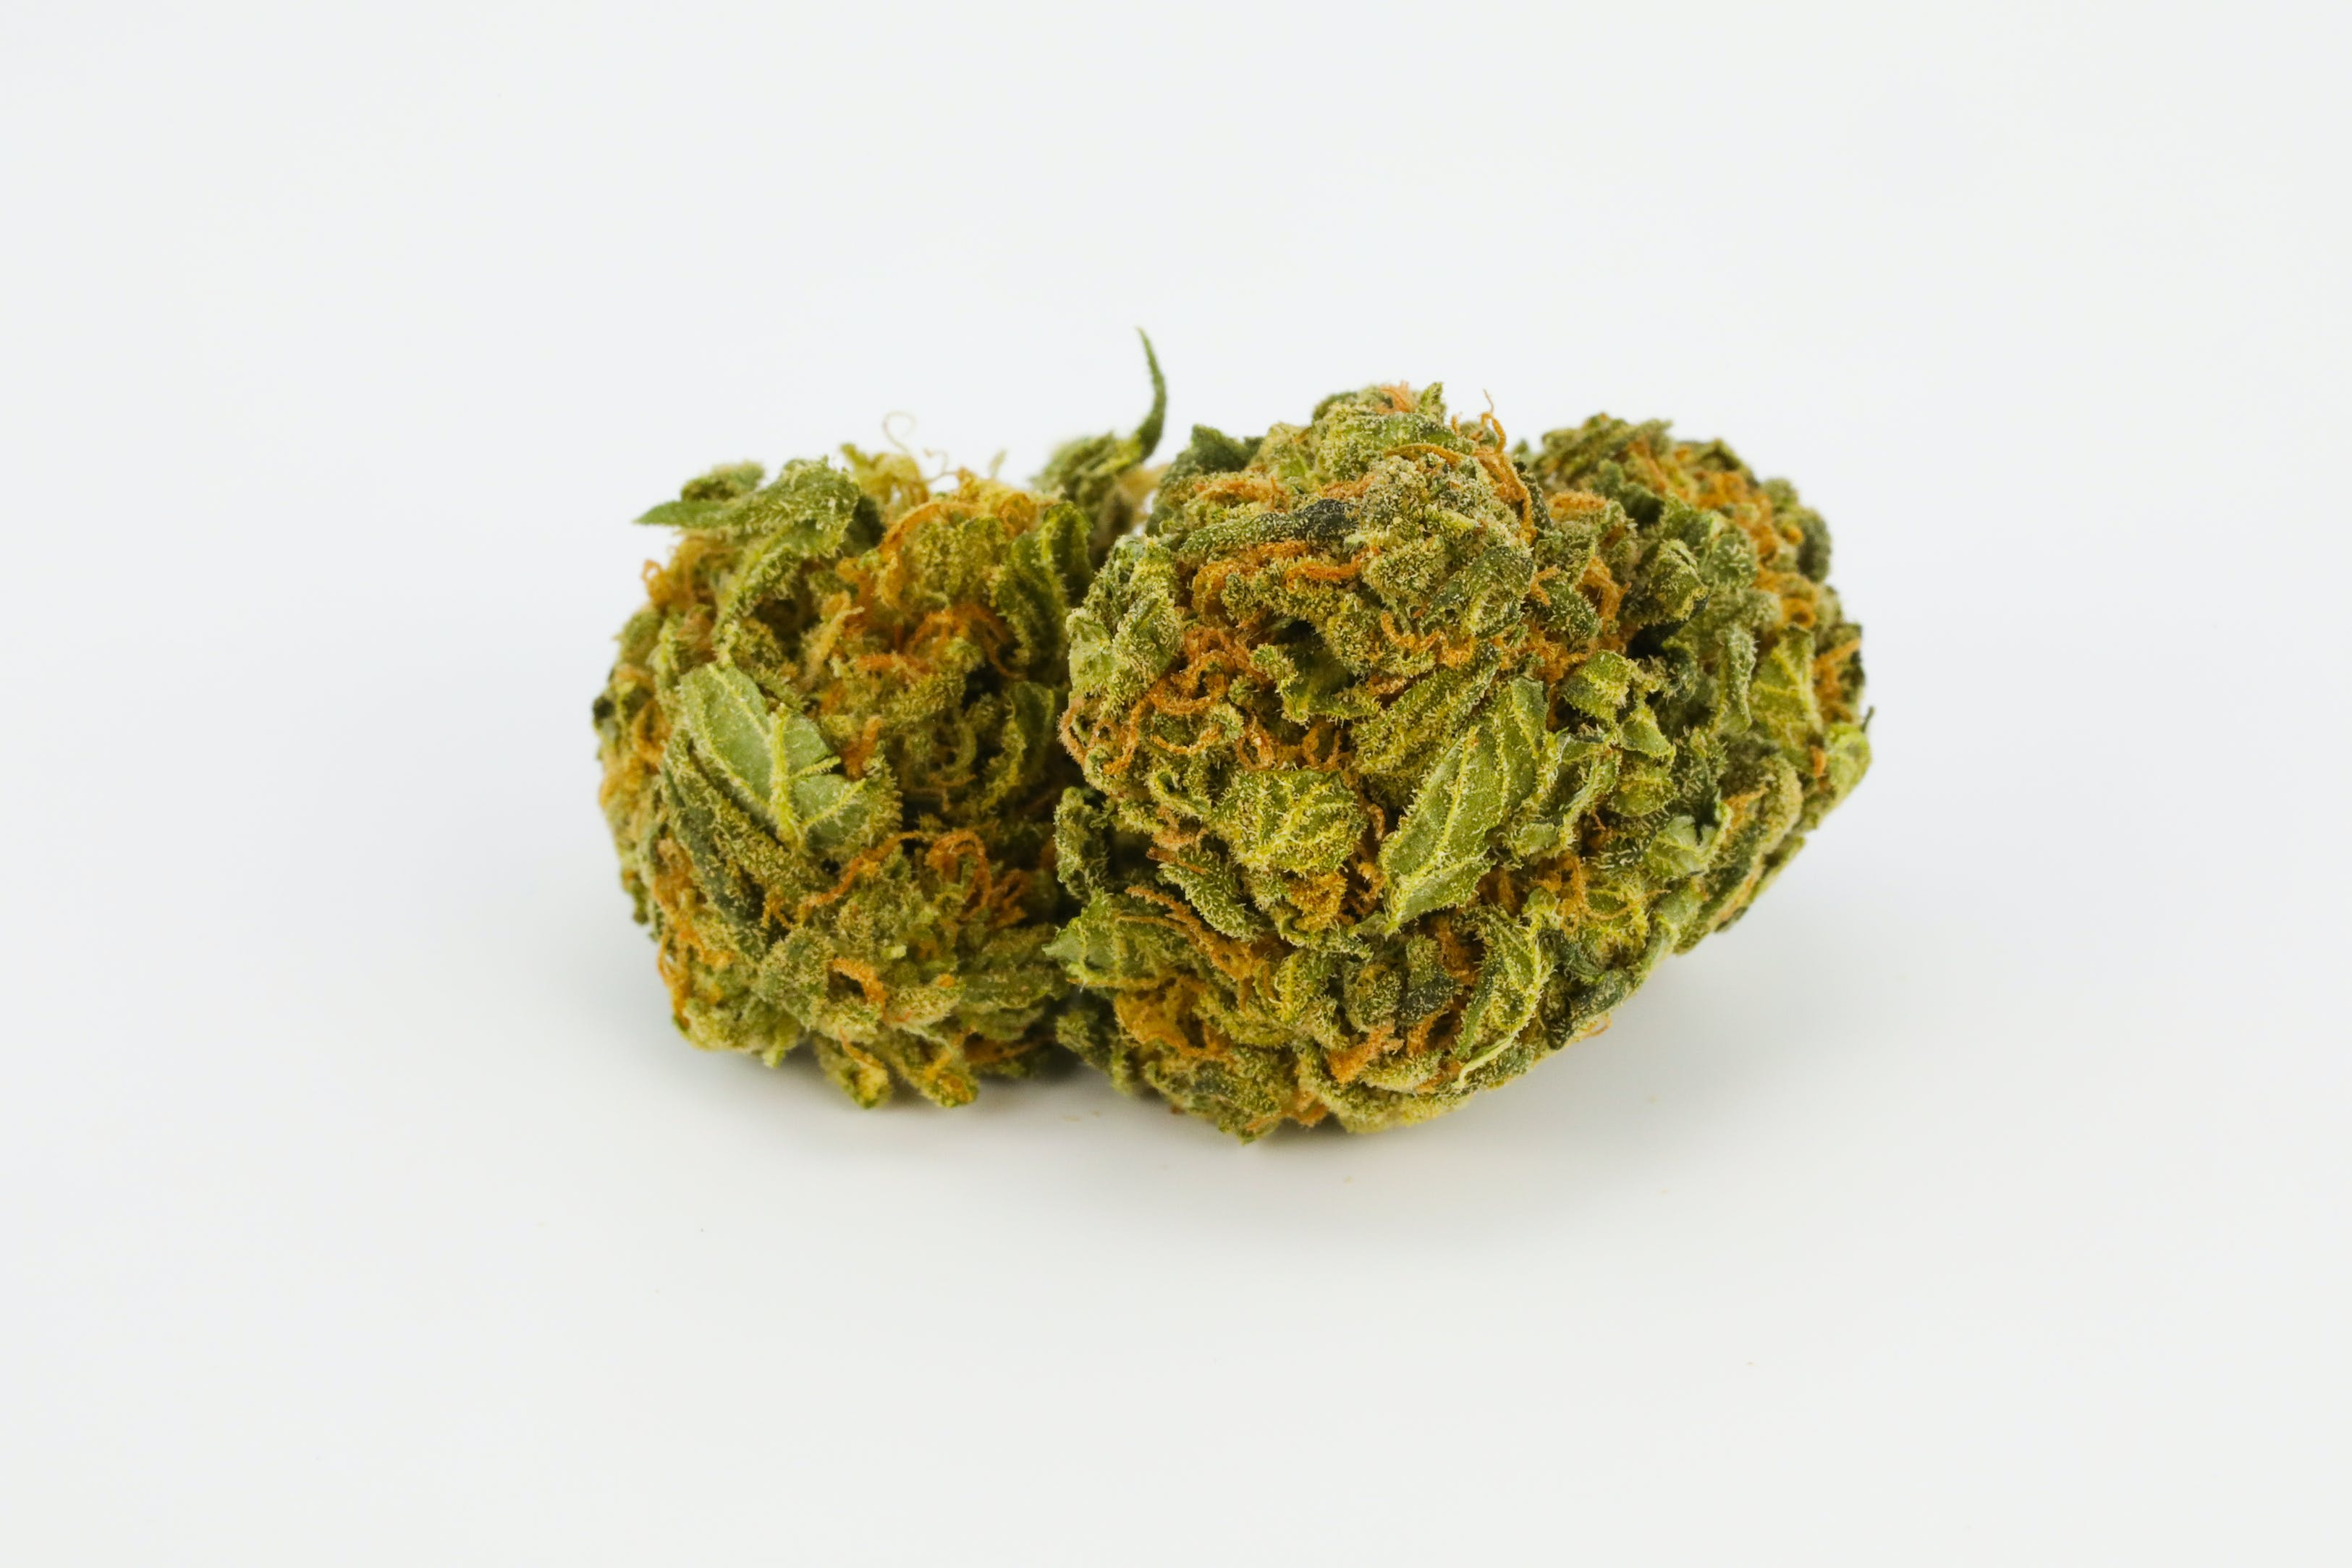 5th Element Weed; 5th Element Cannabis Strain; 5th Element Indica Marijuana Strain